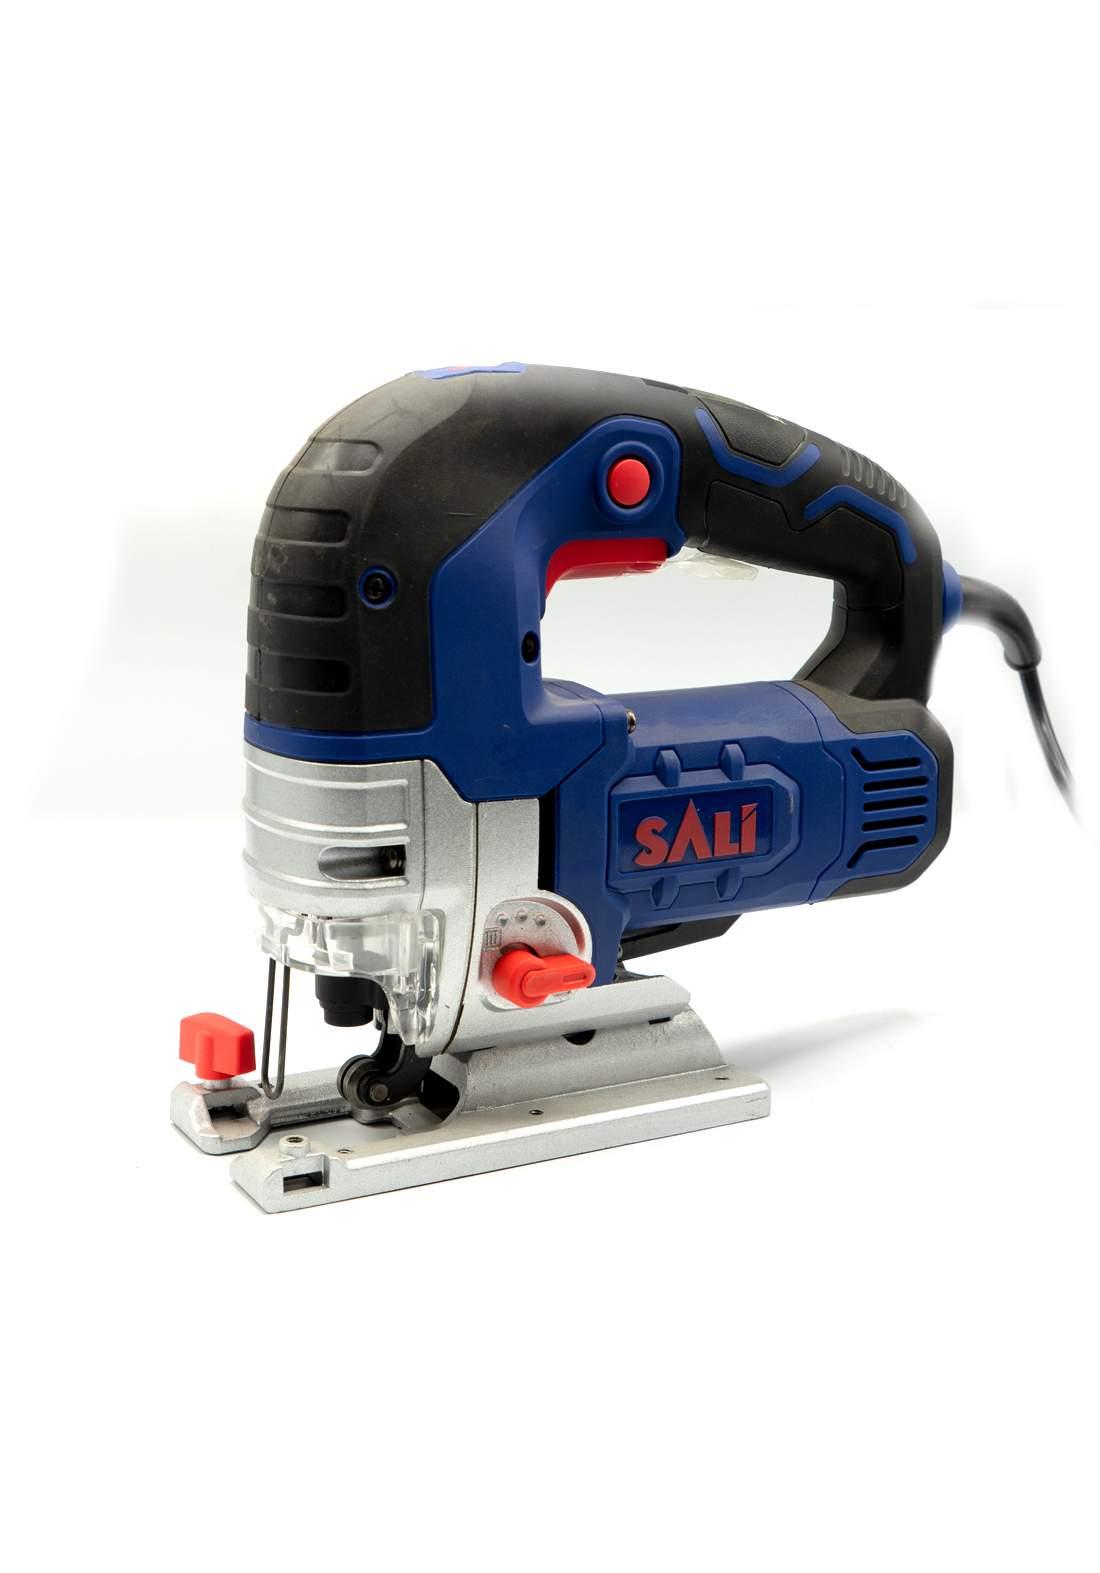 Sali 3511P  High Quality Electric Jig Saw  600 W منشار تخريم منضدي